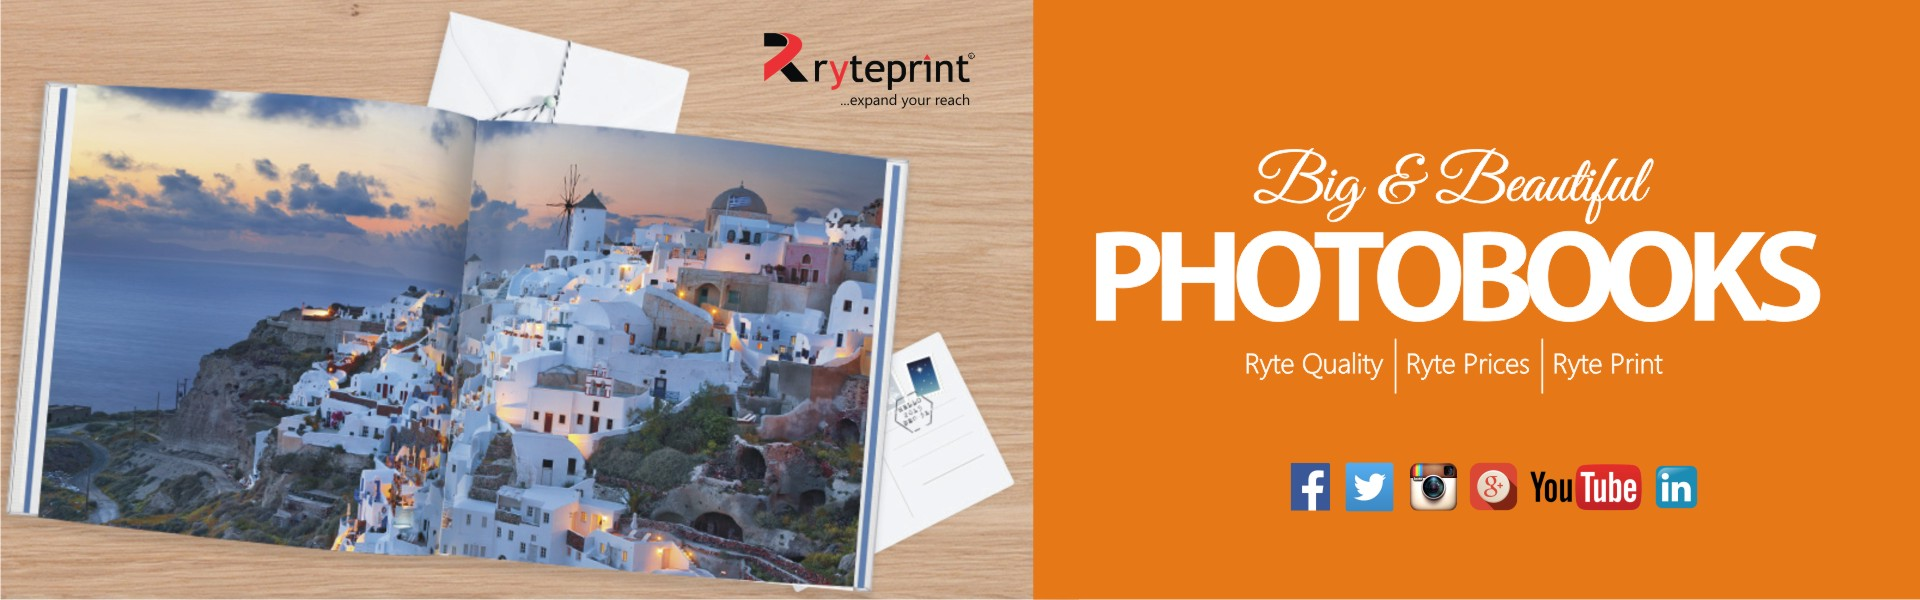 Ryteprint Photobook